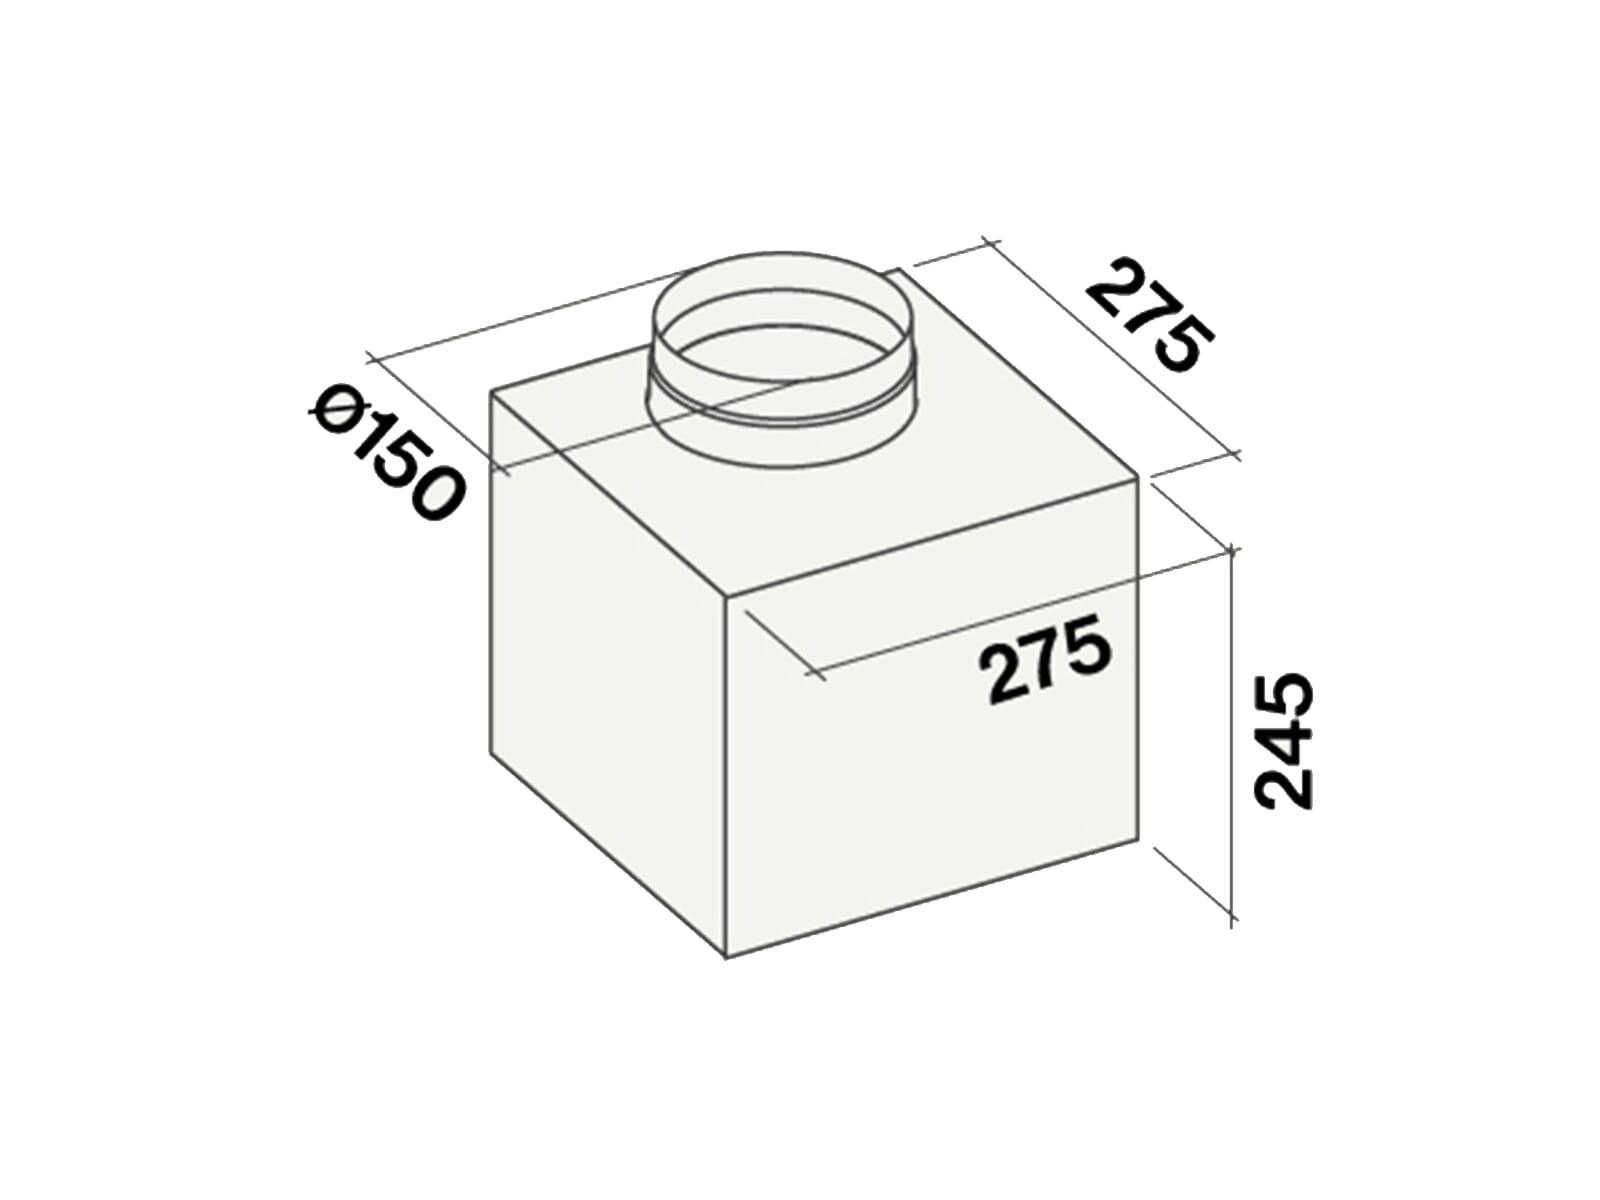 Falmec Downdraft 120 Tischhaube Weiß